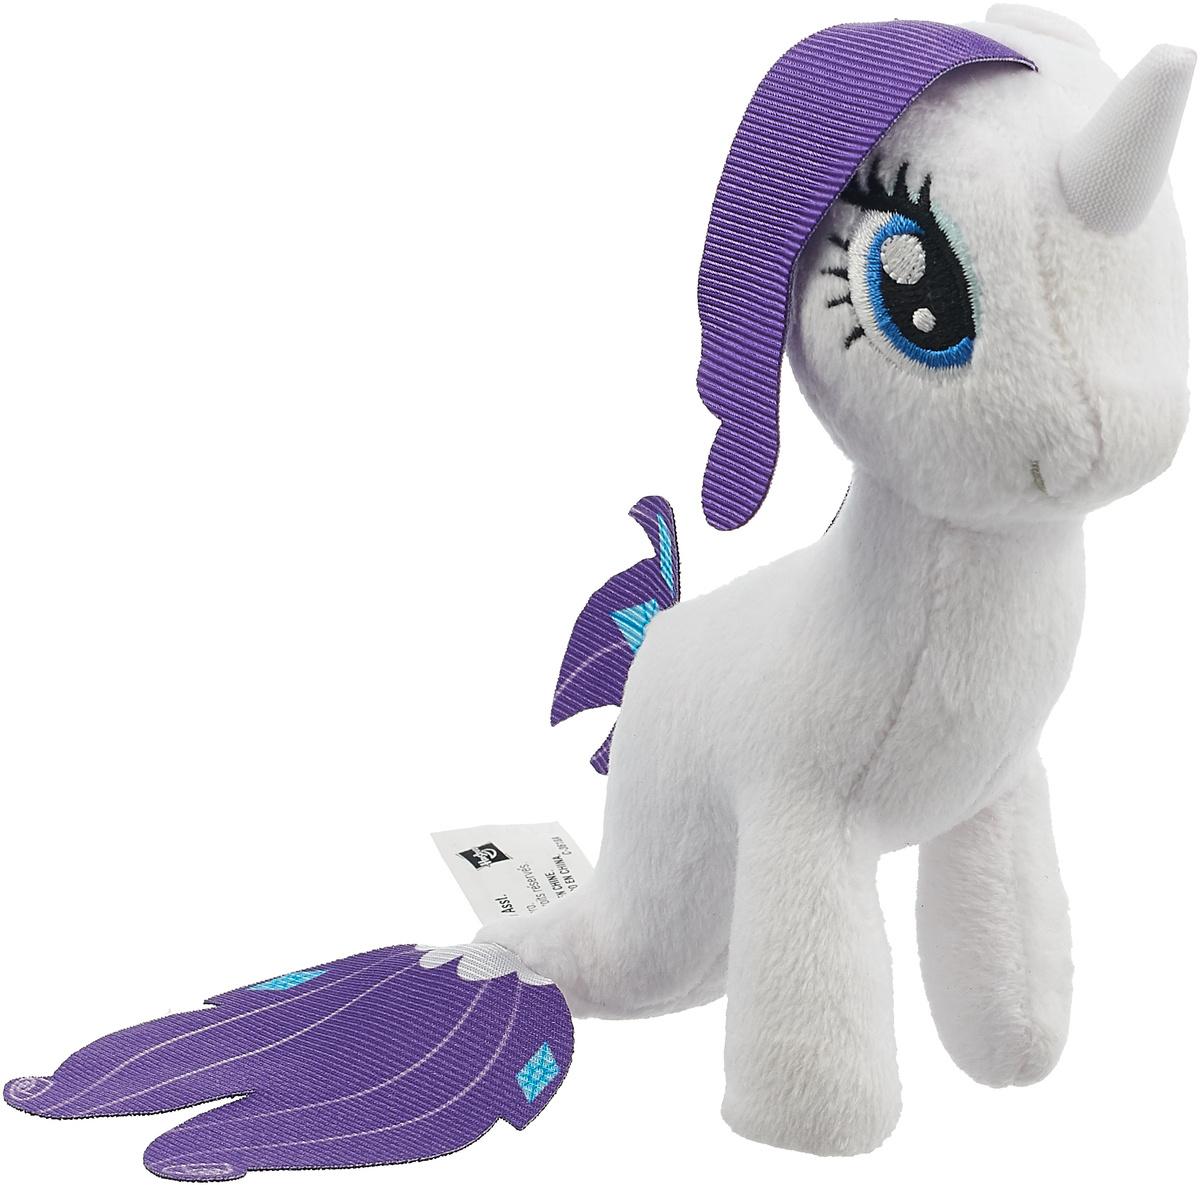 Игрушка мягкая подводная пони рарити (C2844) My Little Pony, Hasbro #1